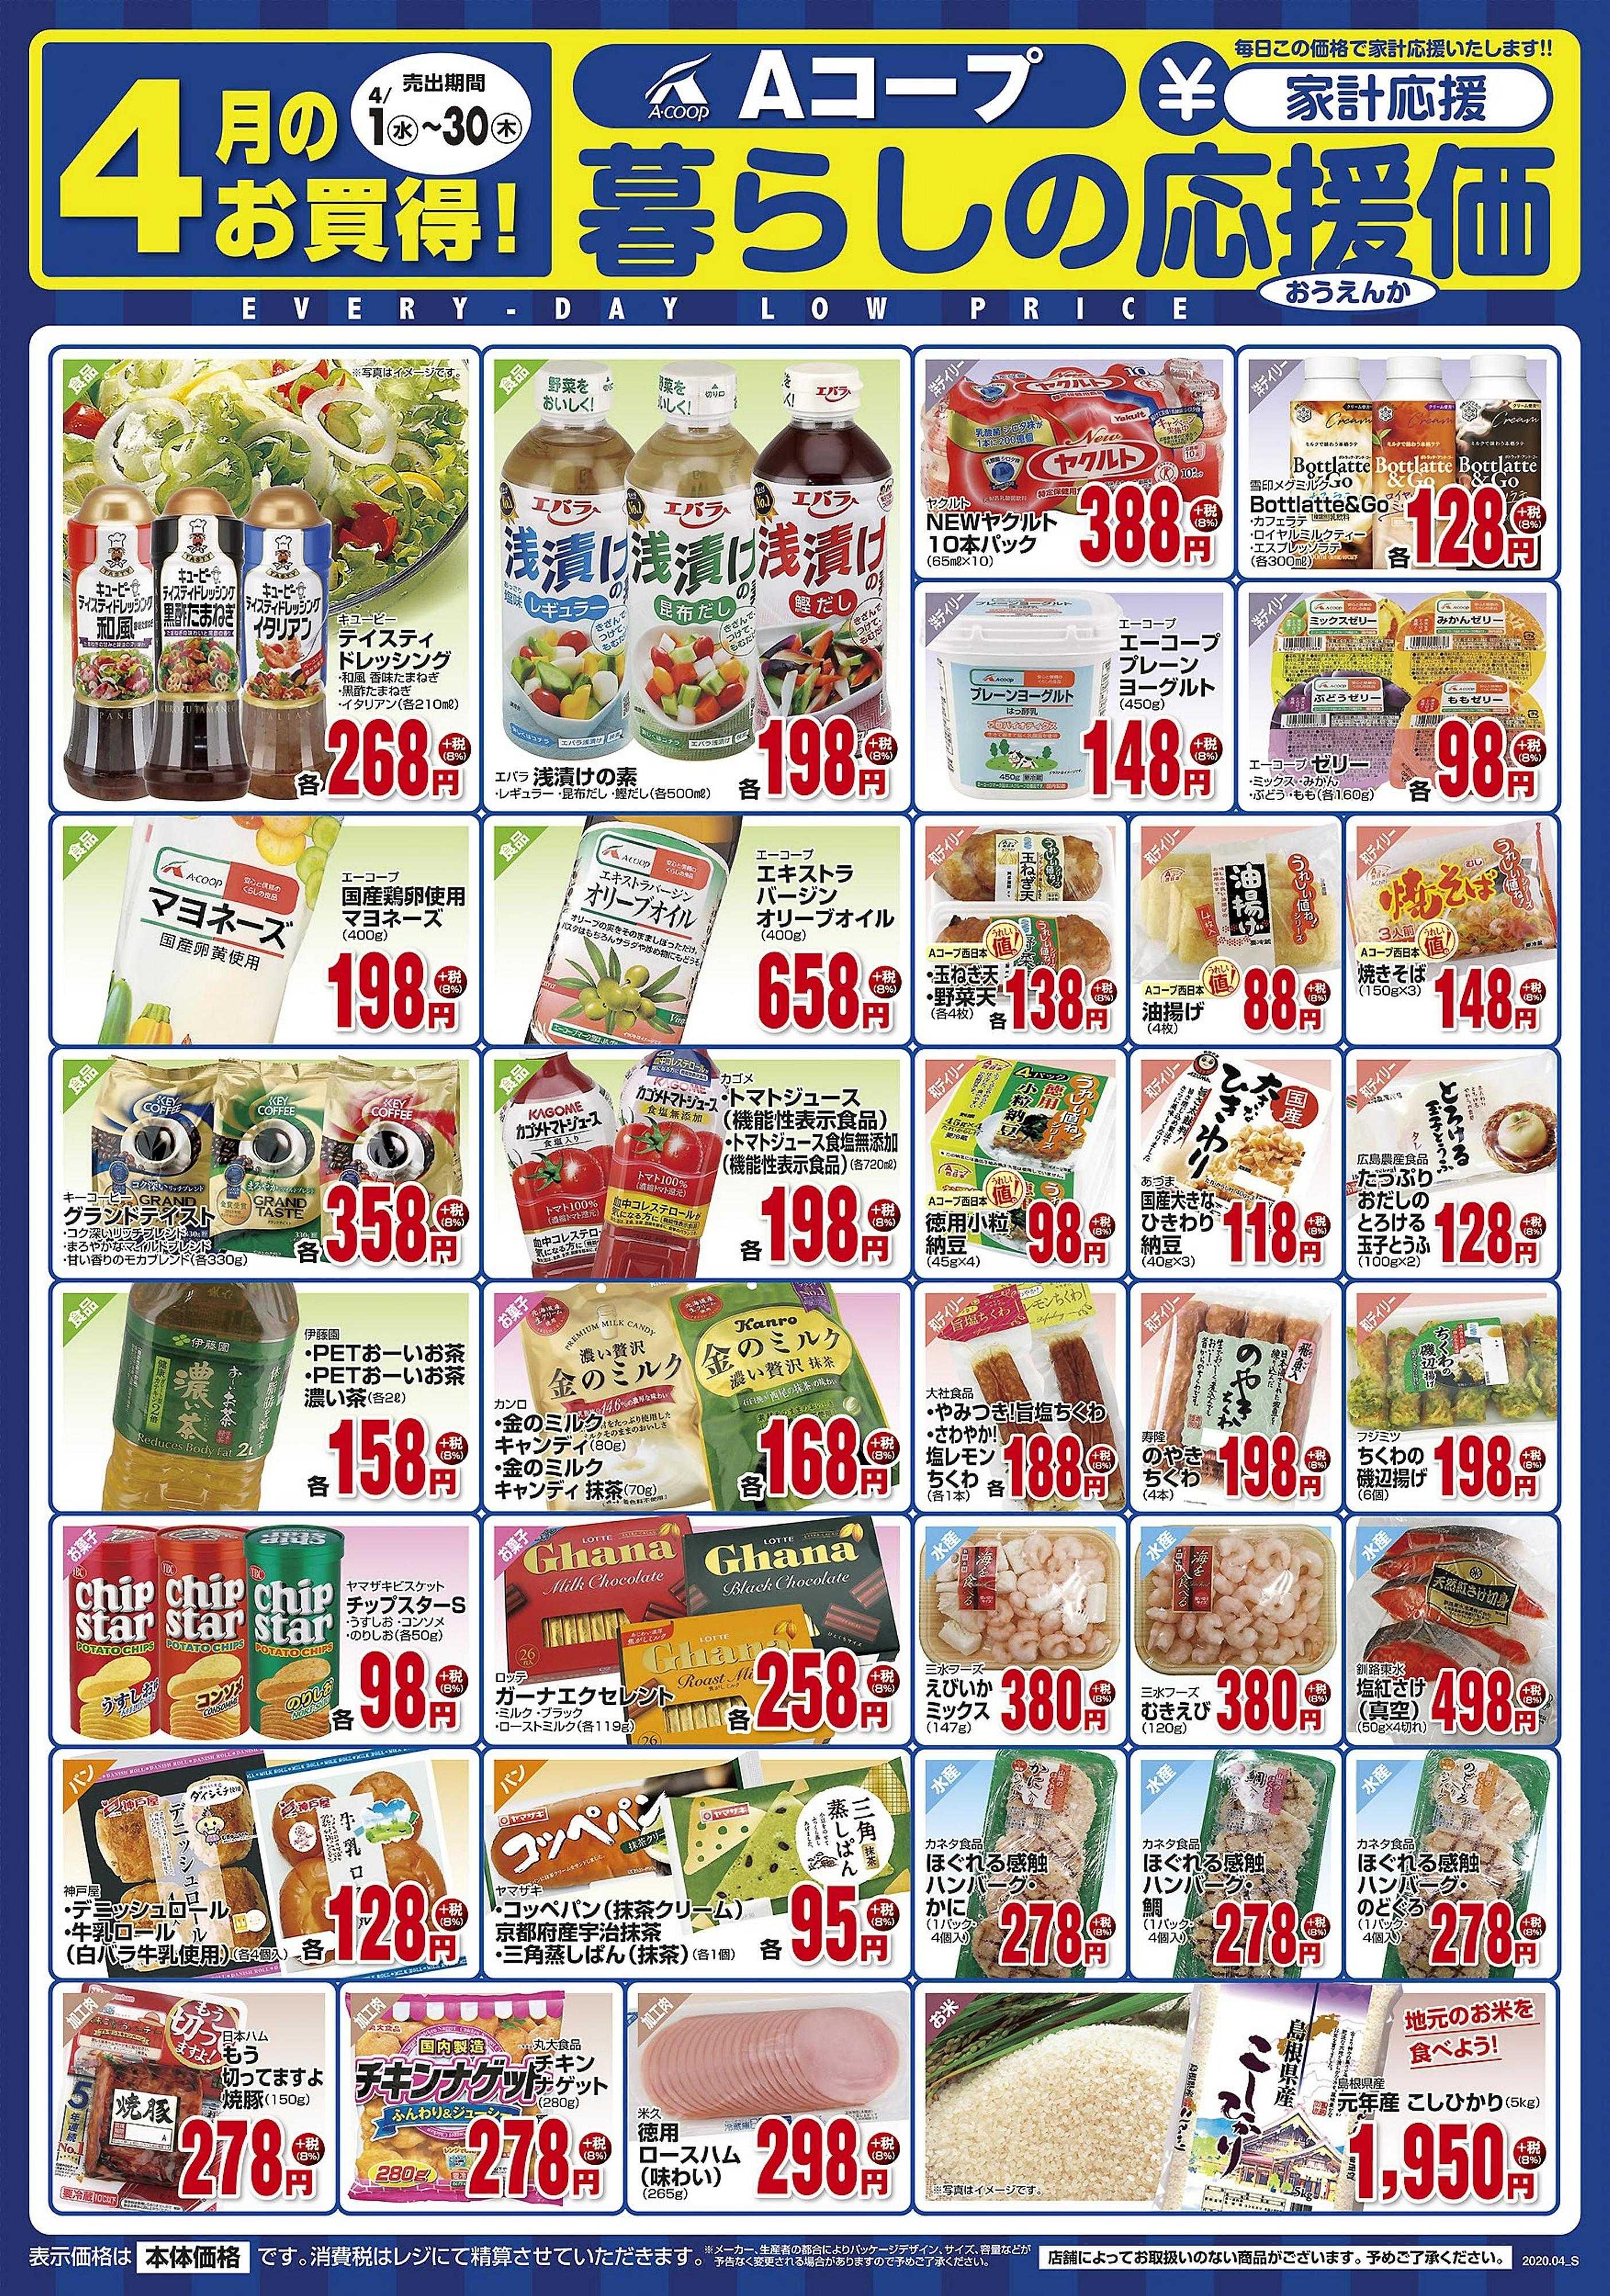 Aコープ西日本 島根エリア【4月度】暮らしの応援価